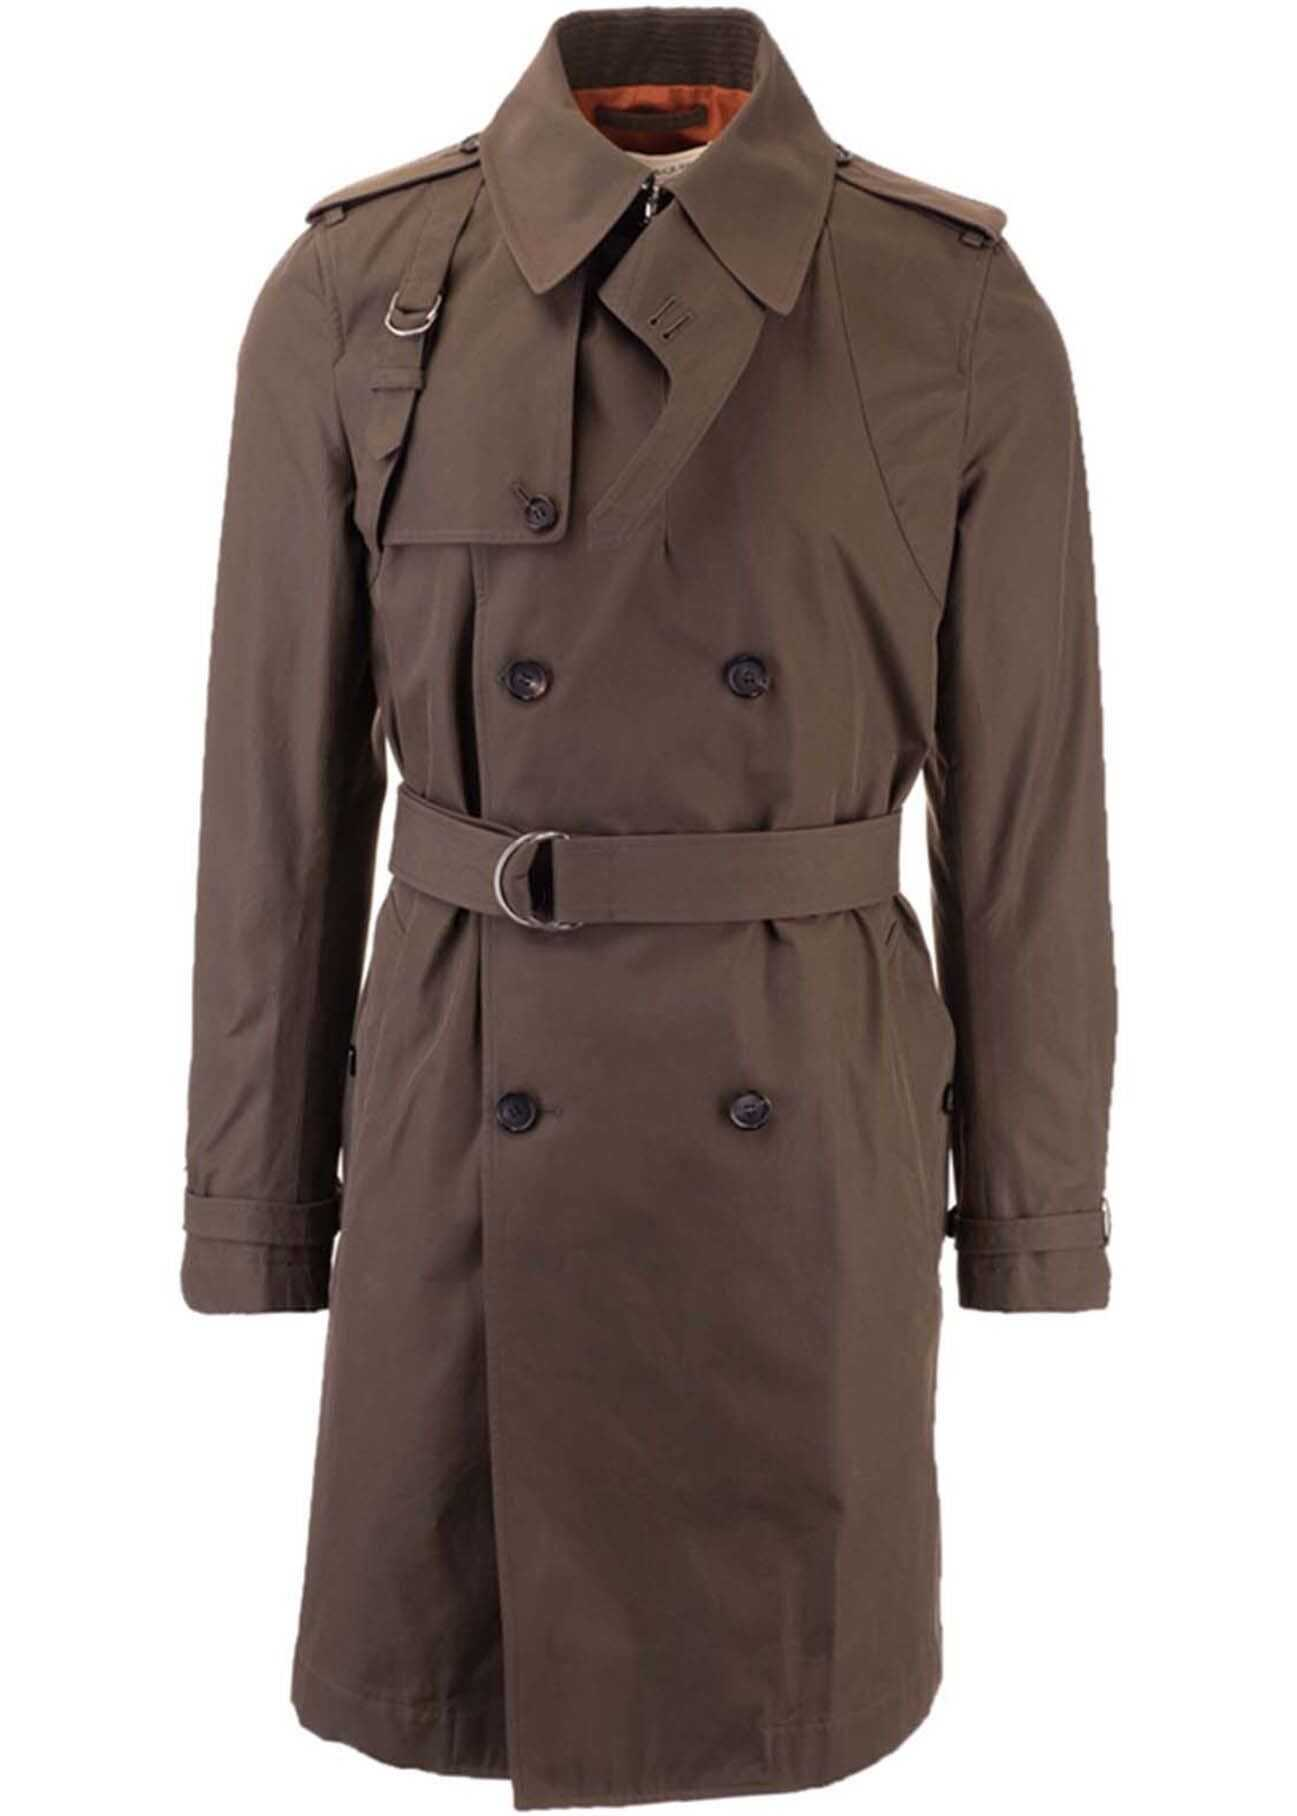 Alexander McQueen Double-Breasted Trench Coat In Khaki Green imagine